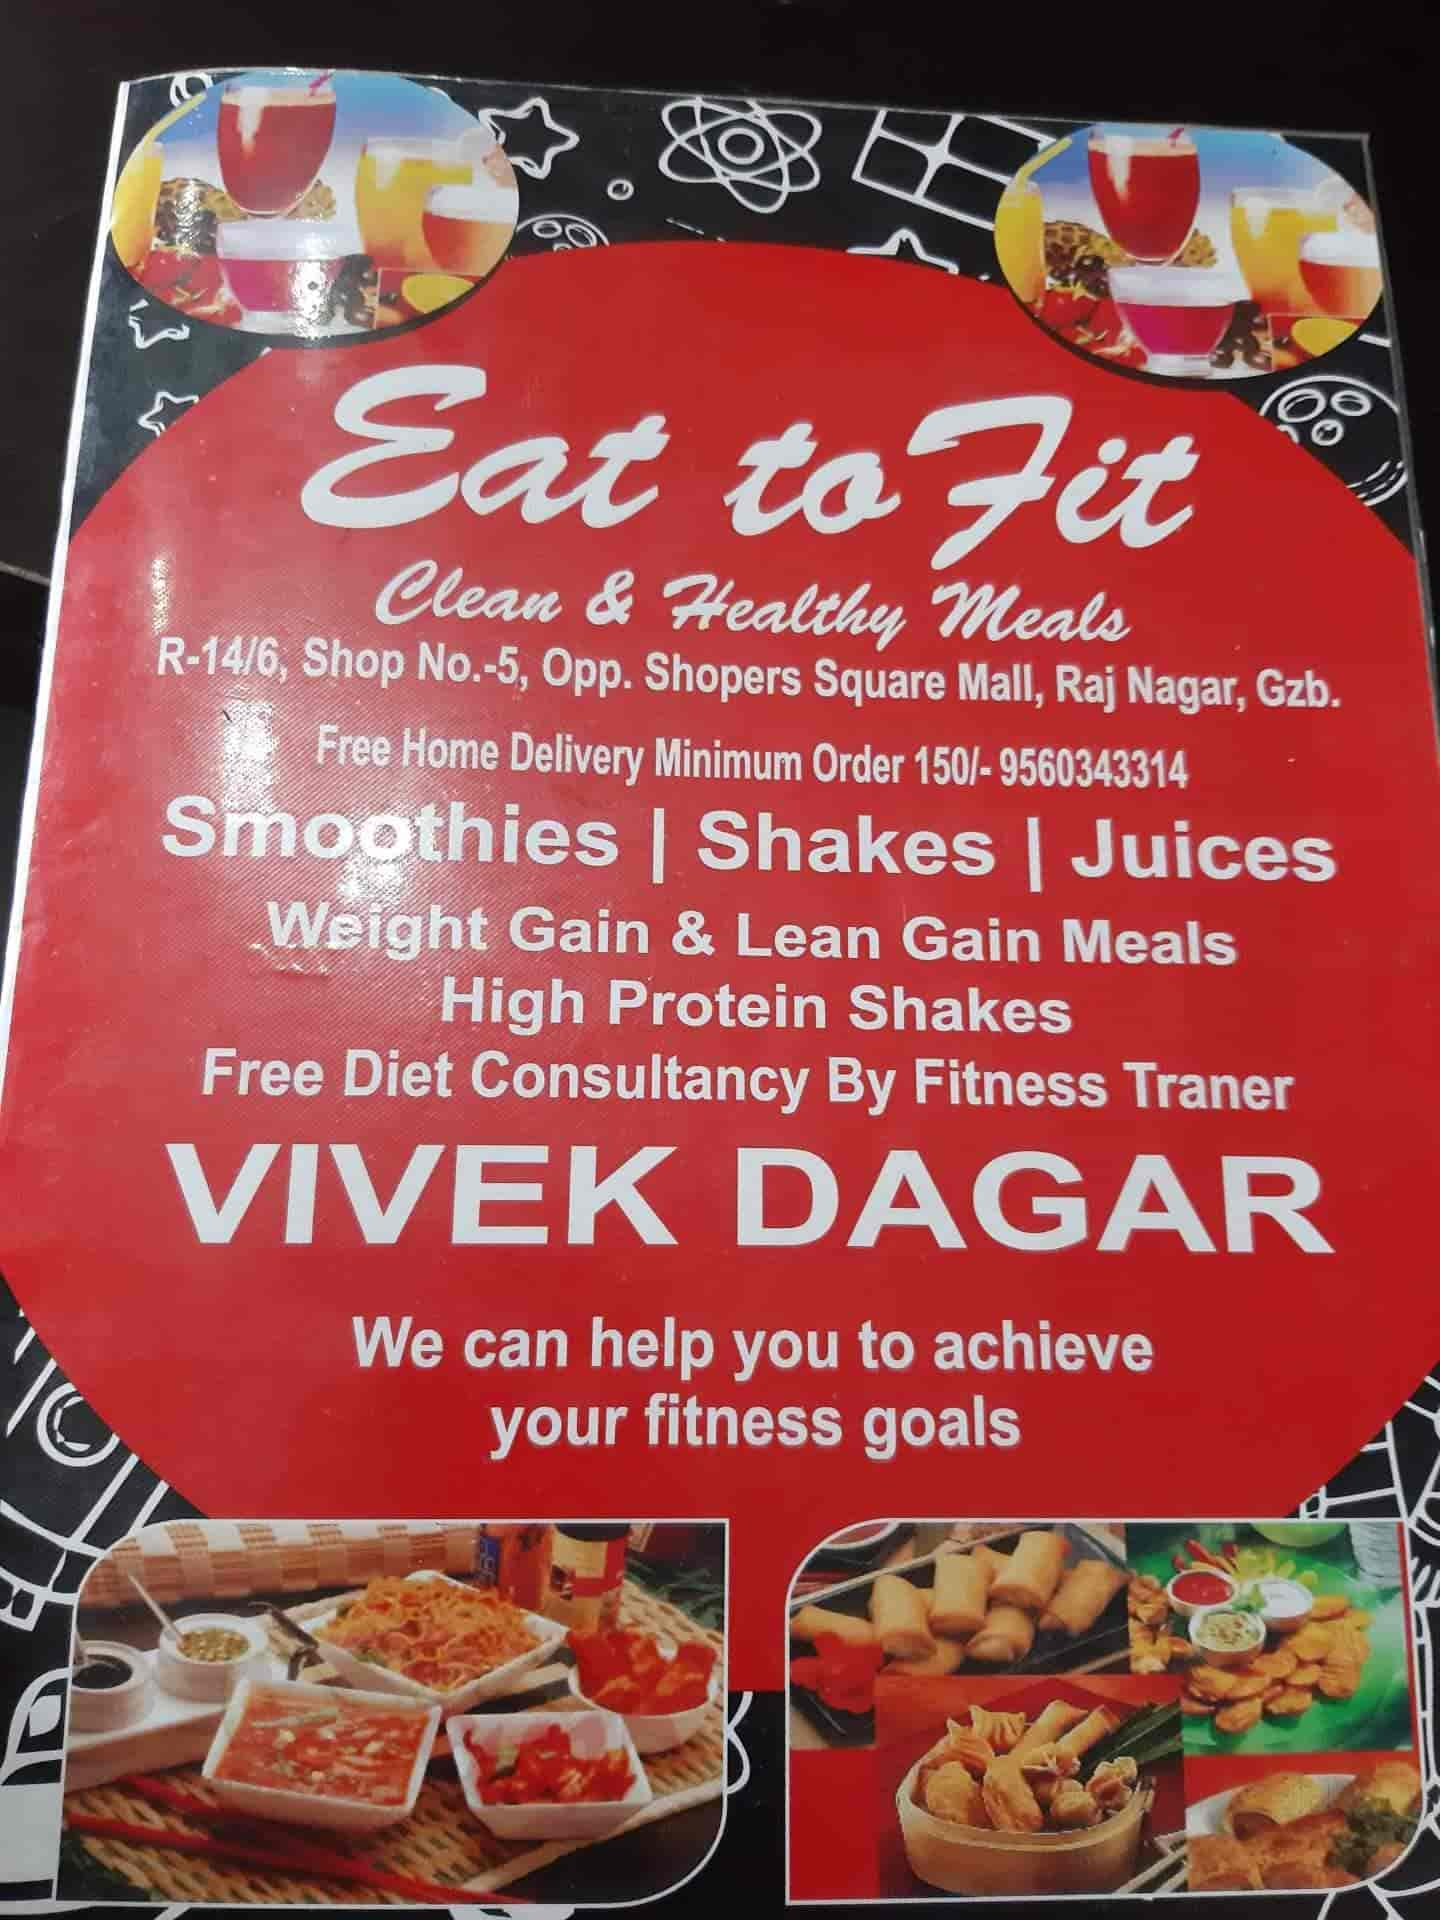 Diet Food Restaurants In Rdc Raj Nagar Ghaziabad Delhi